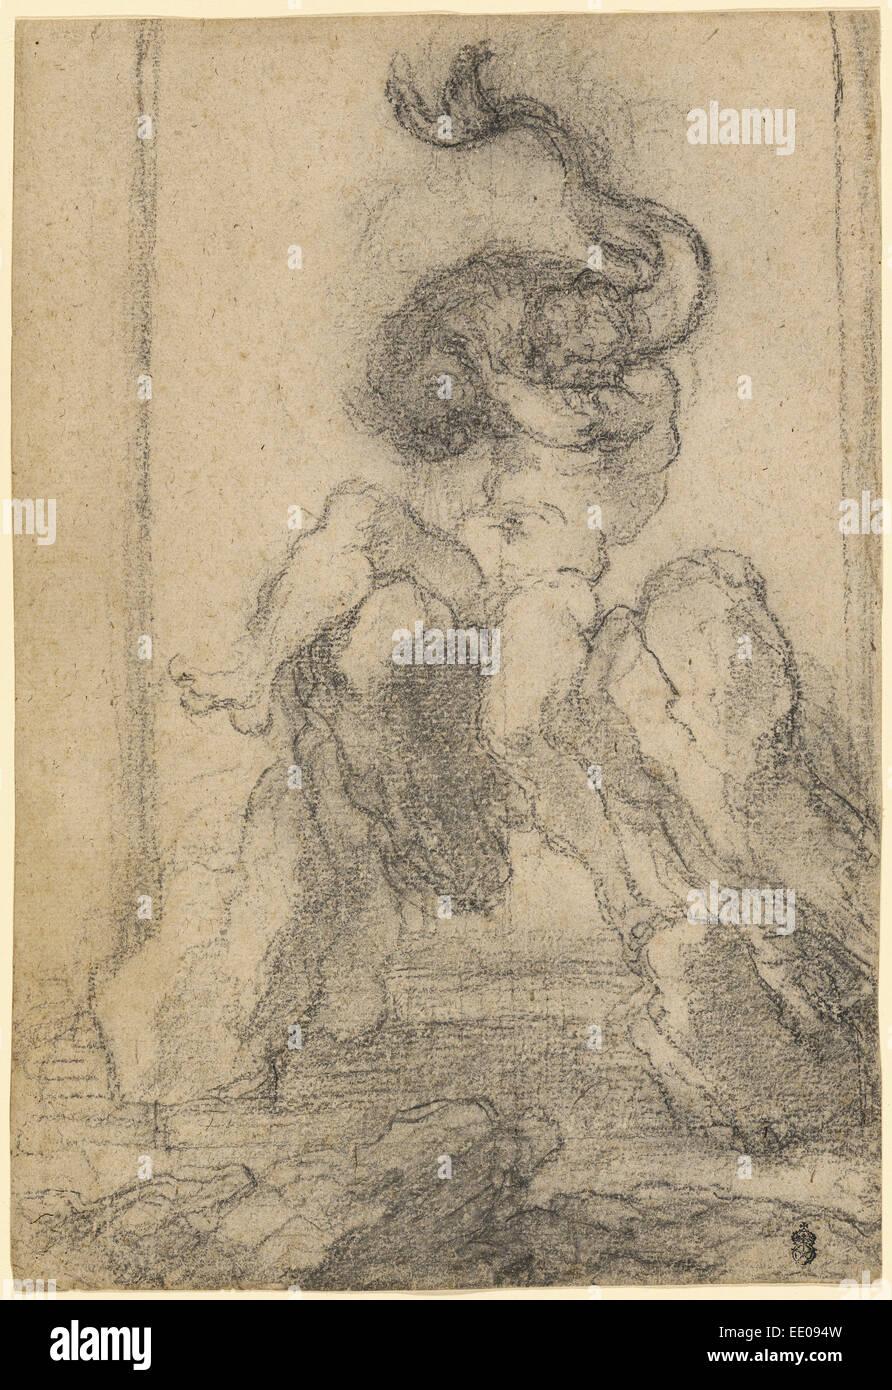 A Marine God with a Dolphin; Gian Lorenzo Bernini, Italian, 1598 - 1680; Italy, Europe; 1652 - 1653; Black chalk - Stock Image